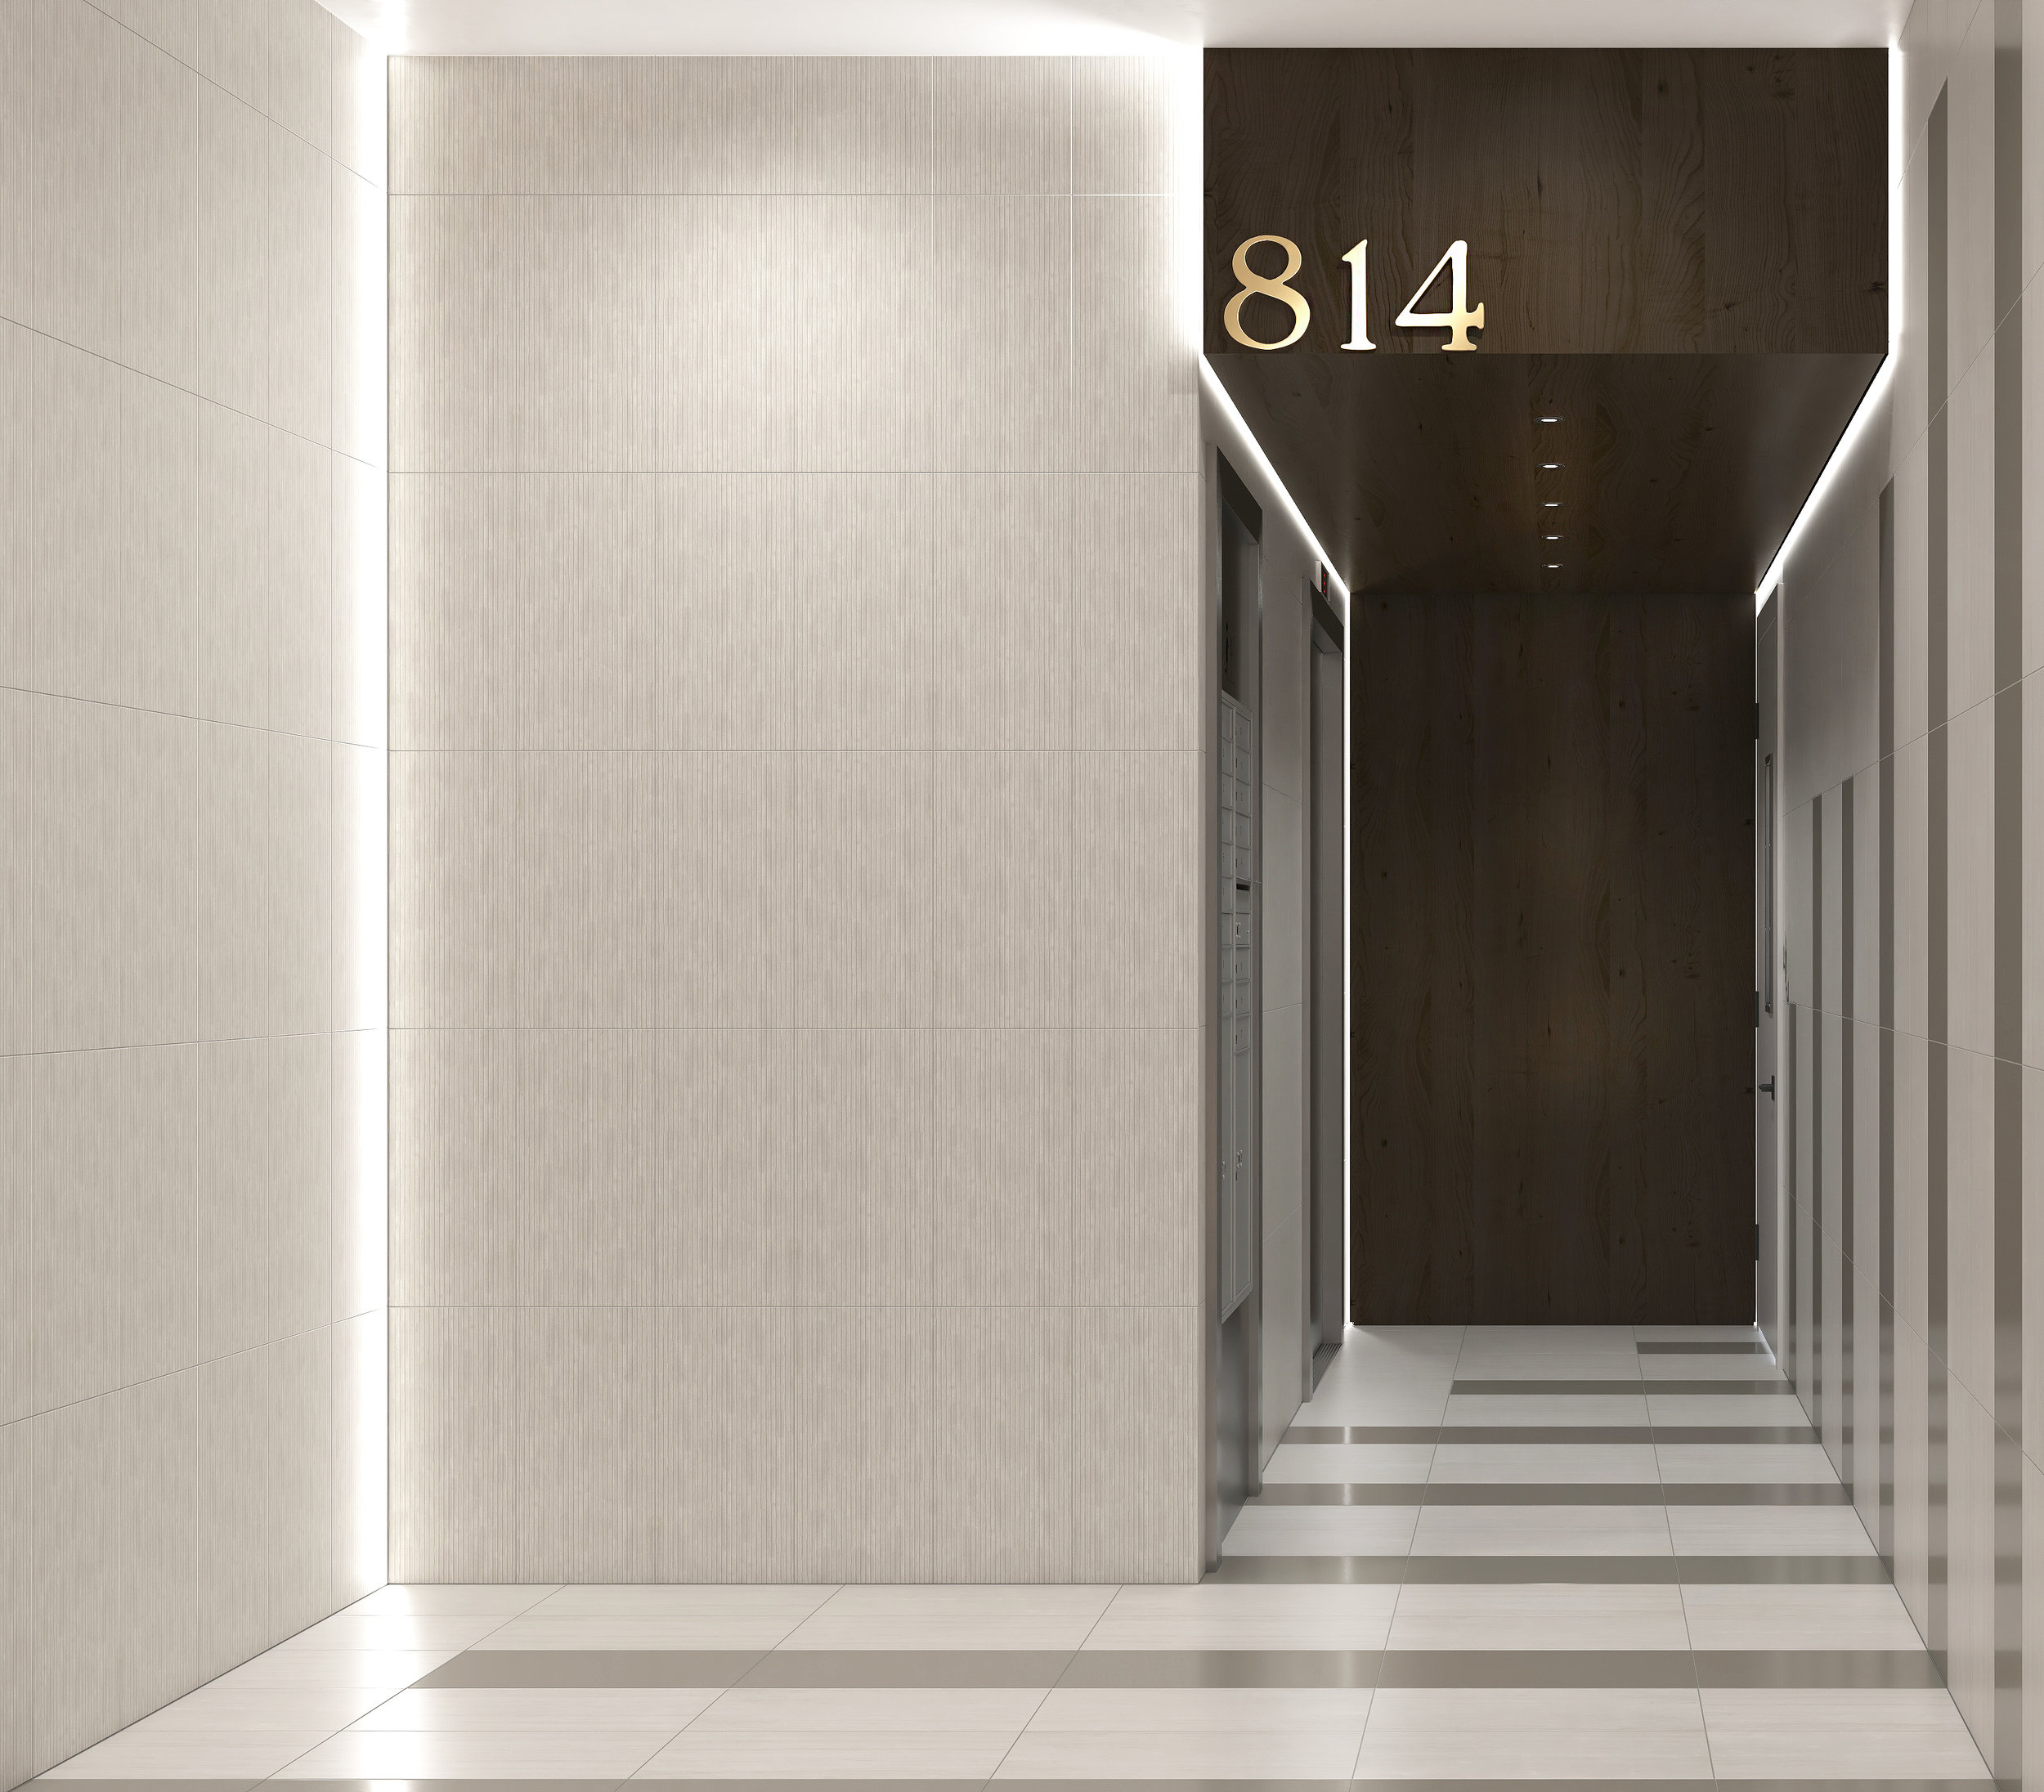 1-lobby-814-010001-edit.jpg